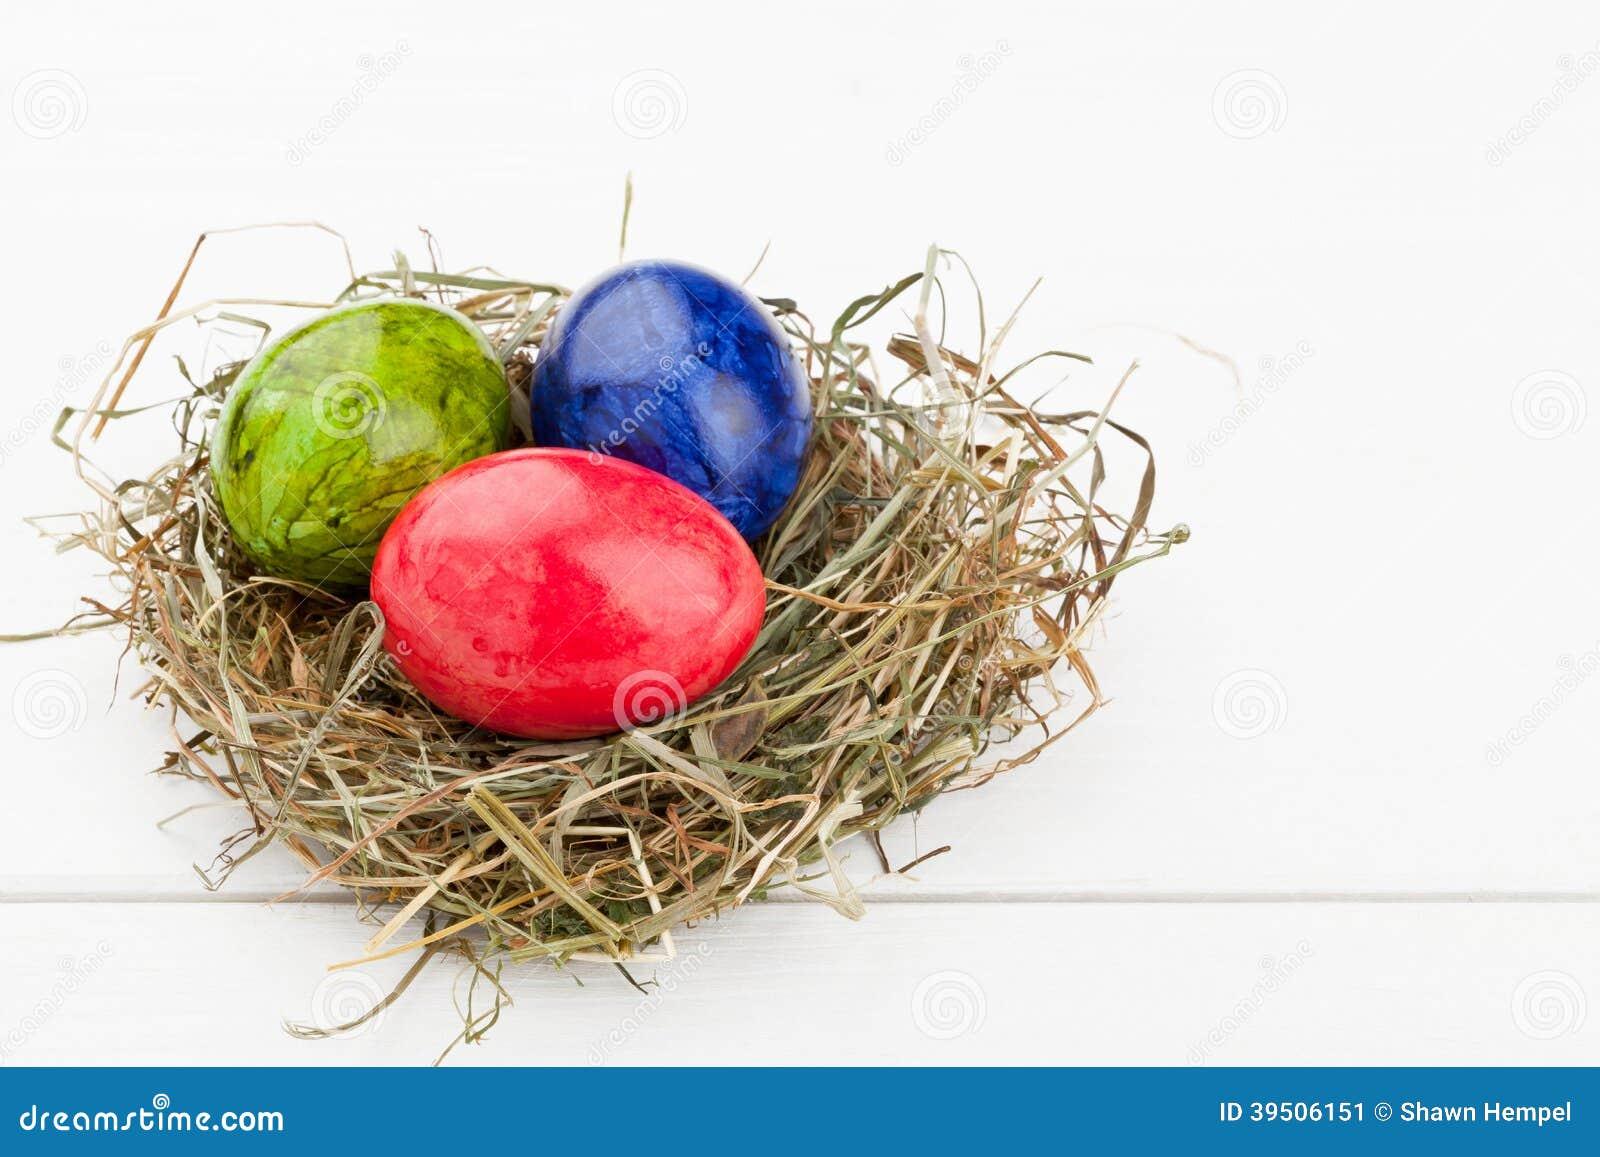 Easter eggs in hay nest on white wood